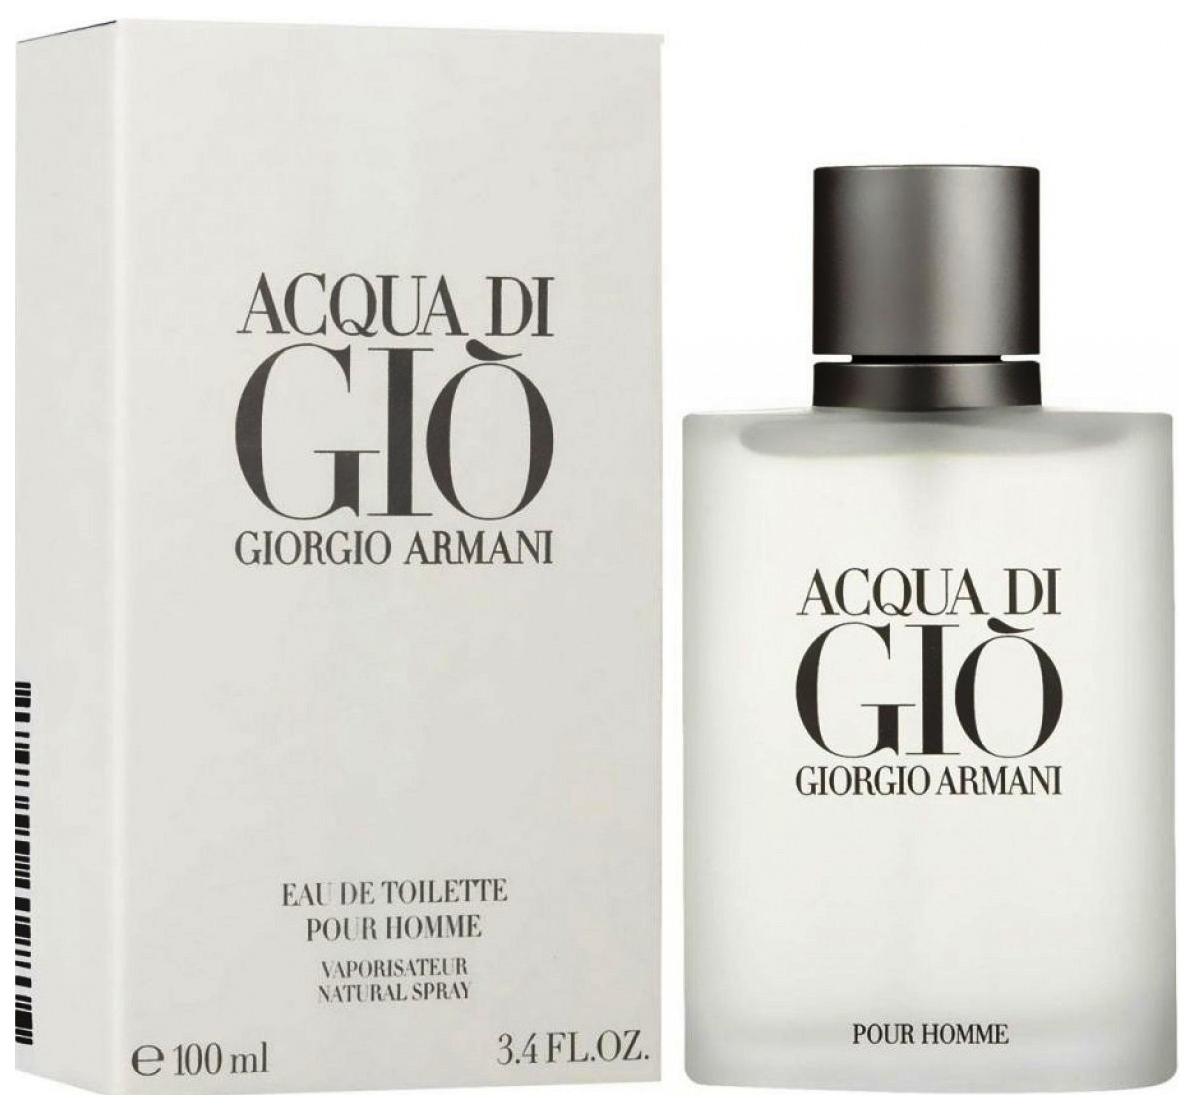 Туалетная вода GIORGIO ARMANI Acqua Di Gio Pour Homme 30 мл фото